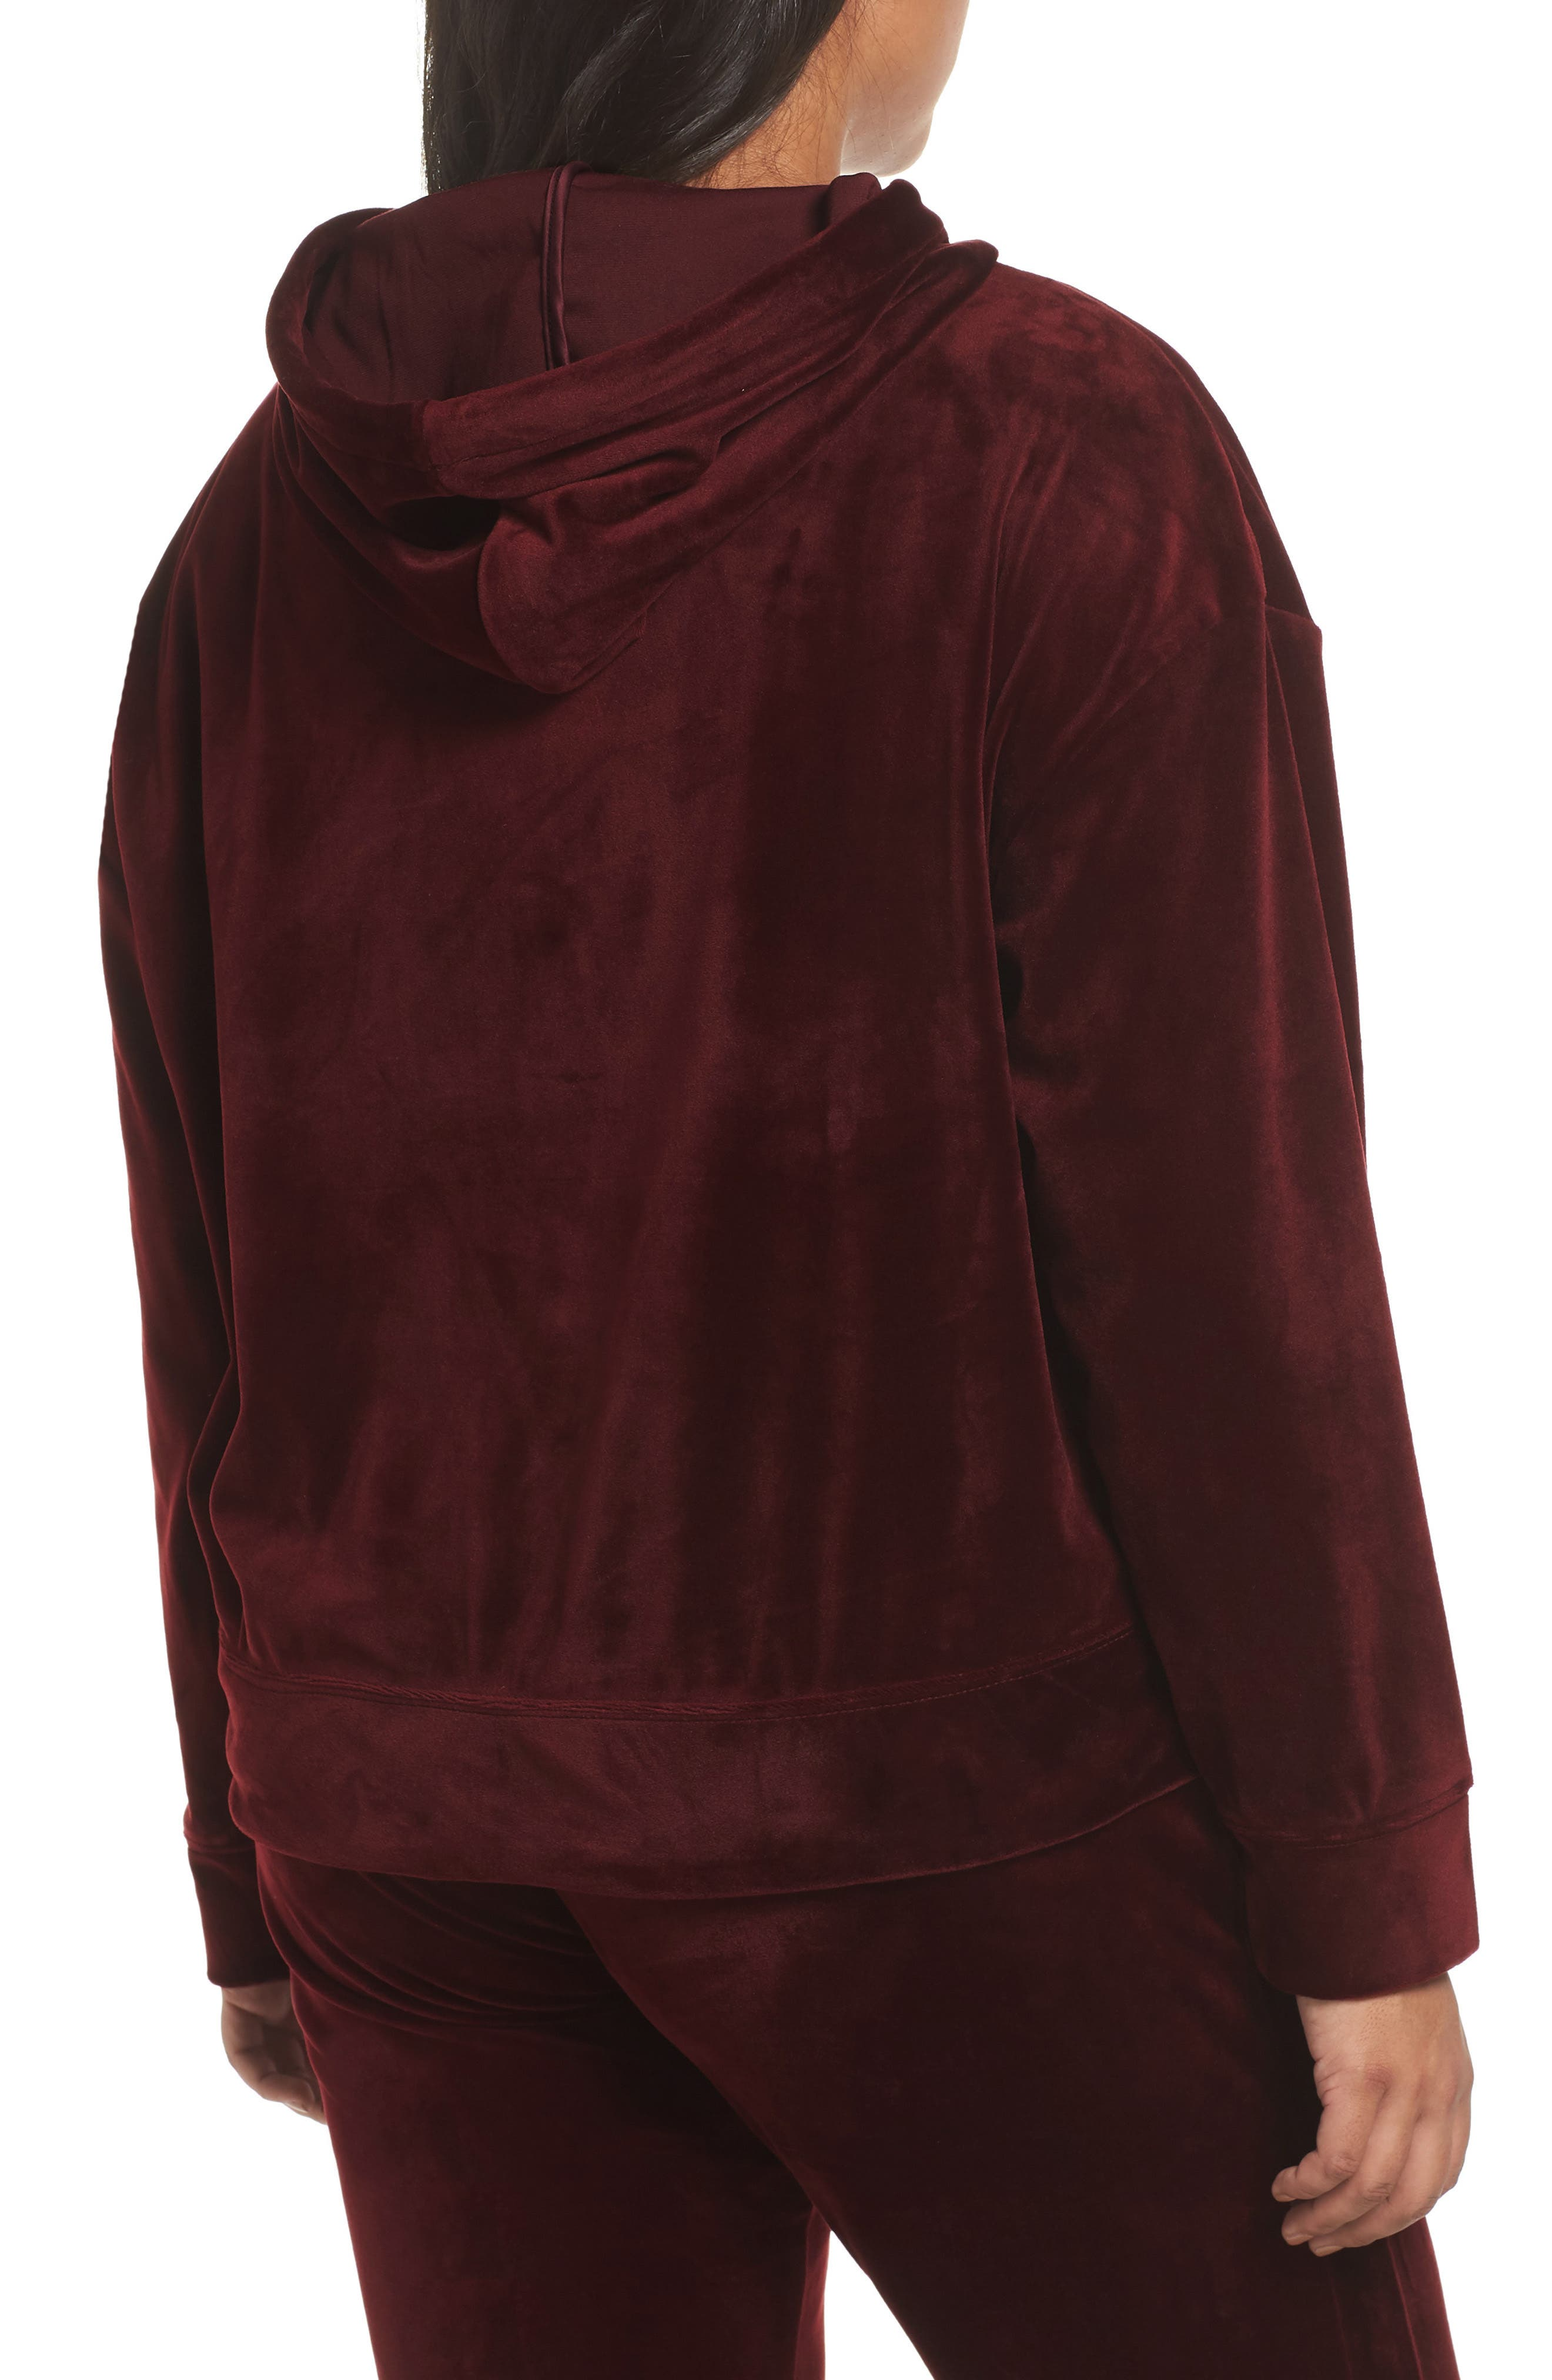 Melrose Brigade Velour Hoodie Sweater,                             Alternate thumbnail 5, color,                             SCARLET